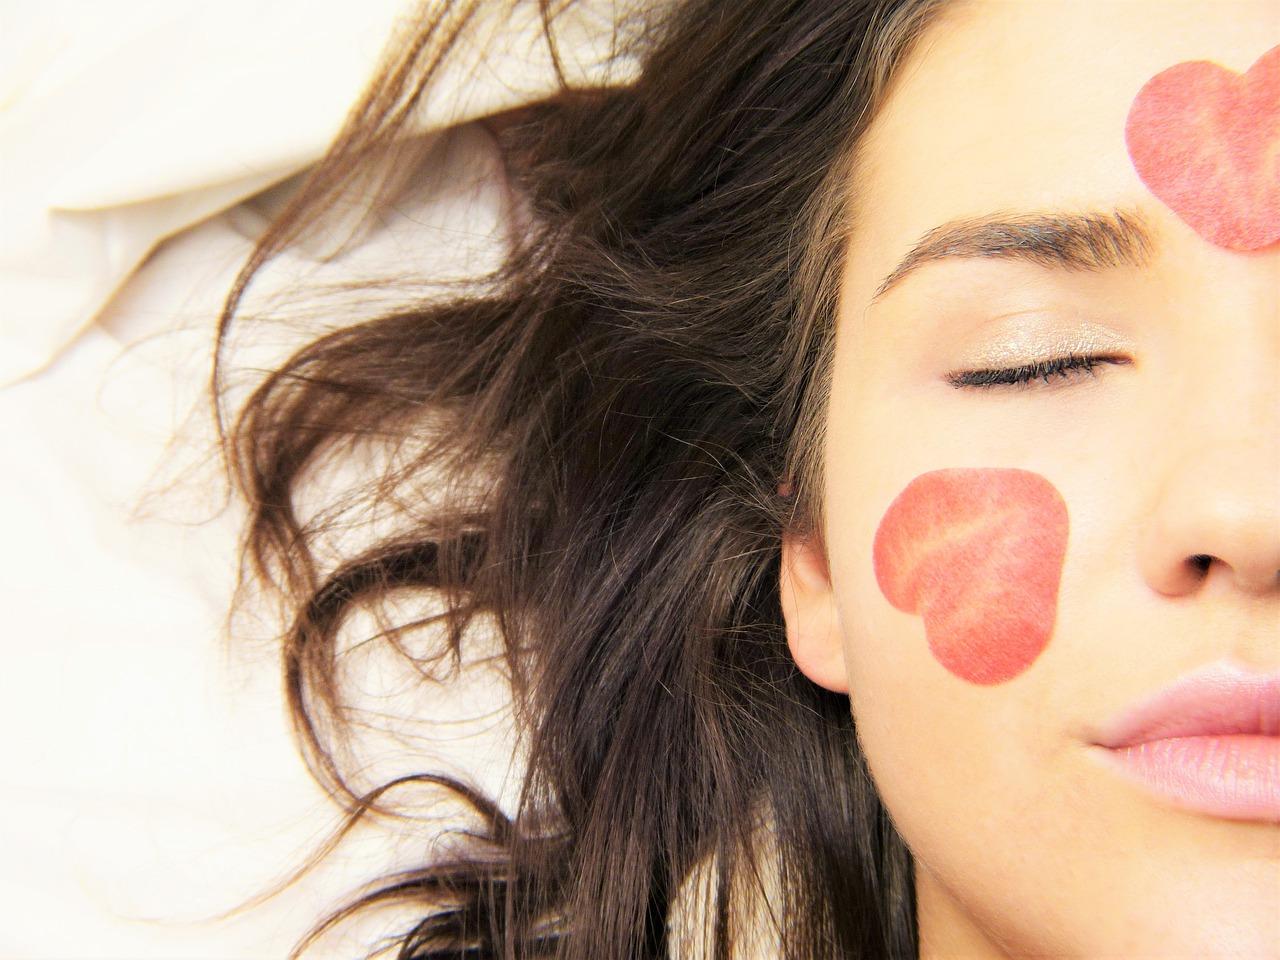 cosmetica e medicina estetica